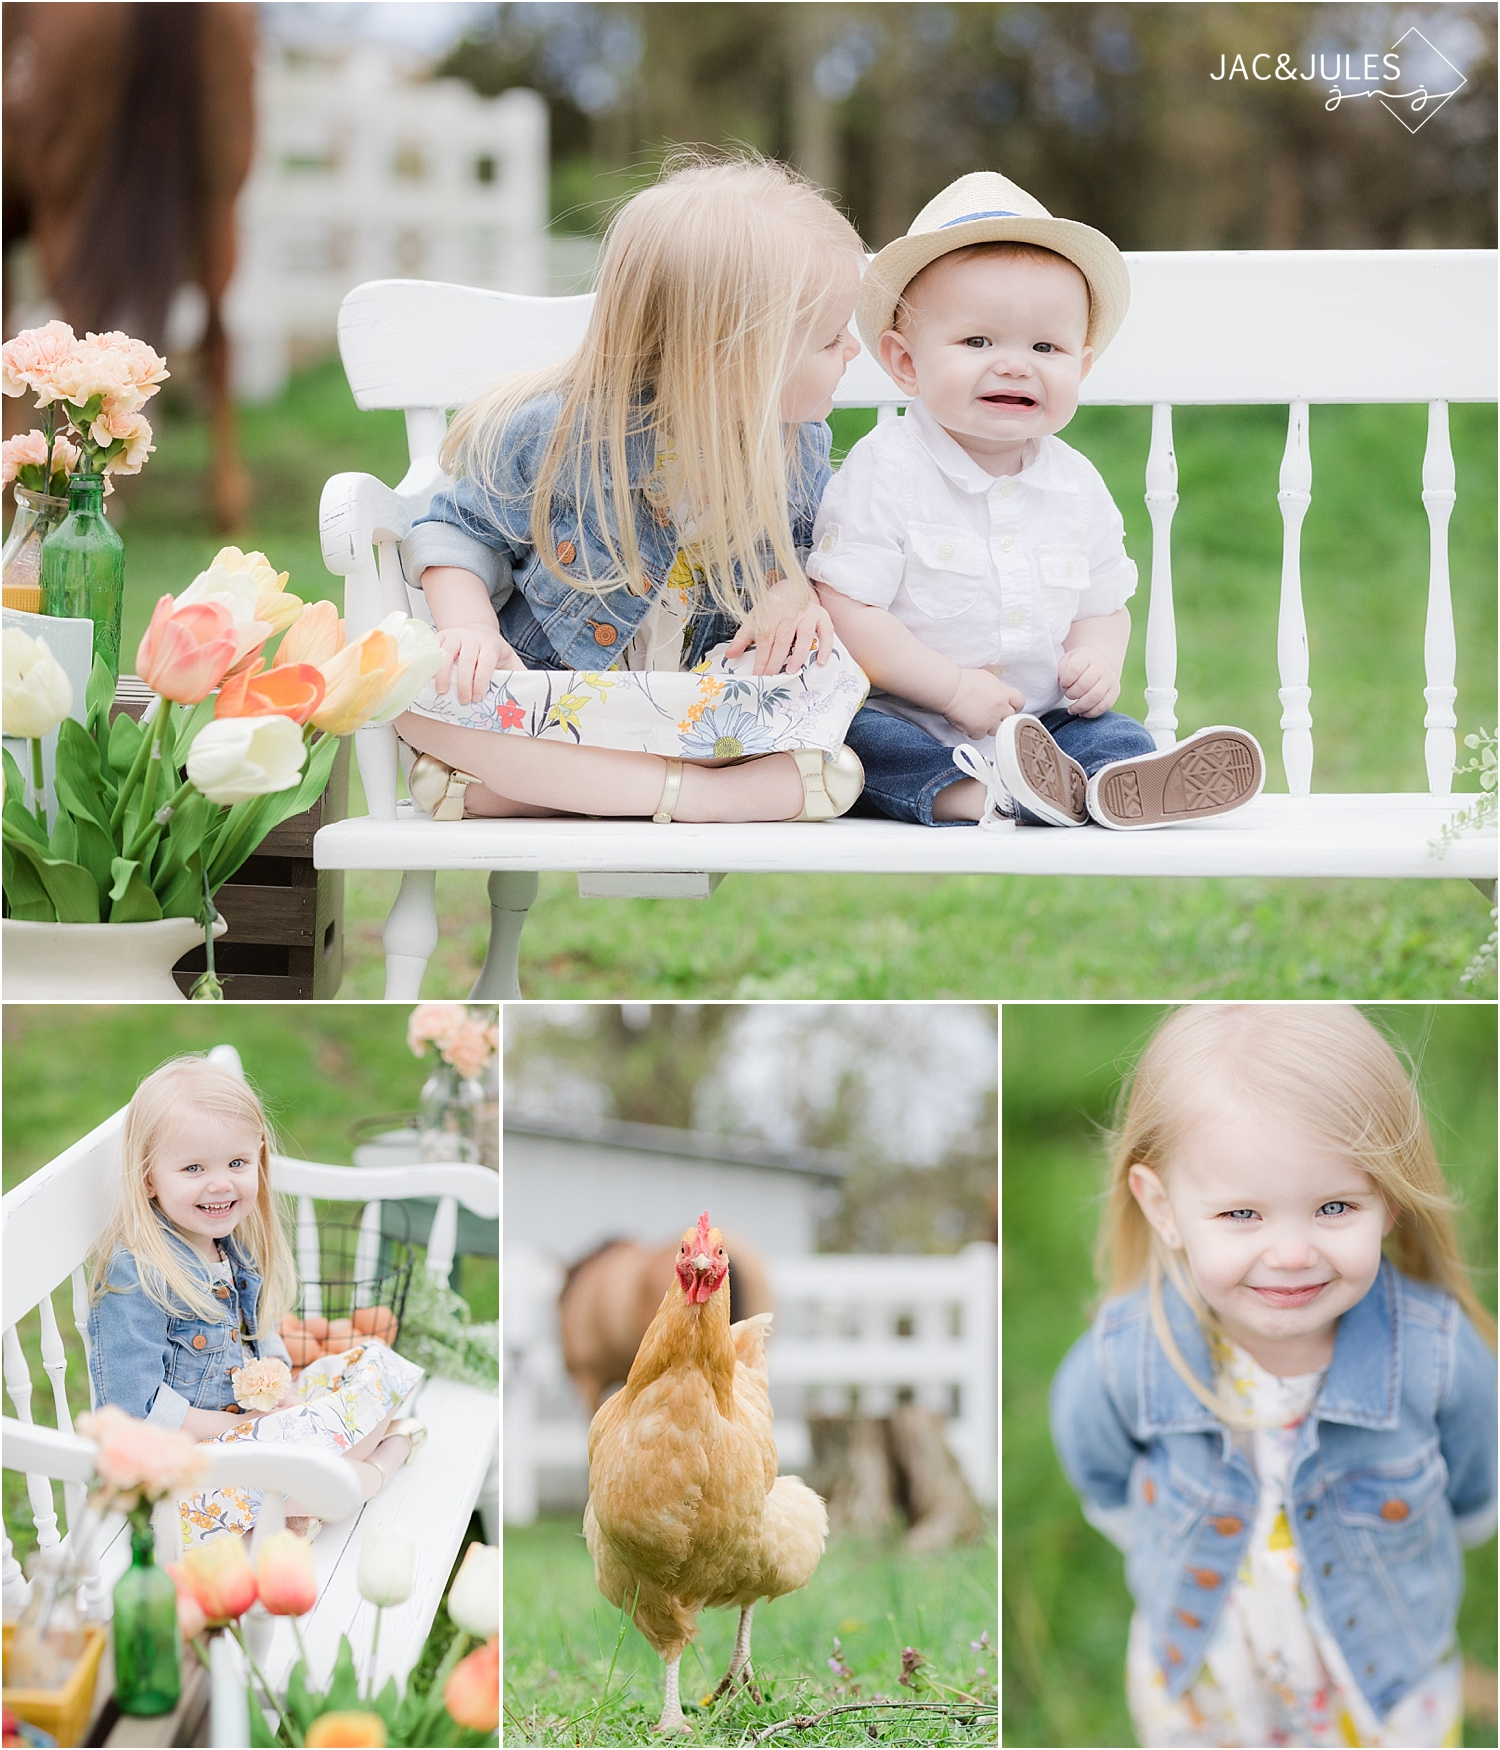 spring photos of kids on a farm in nj